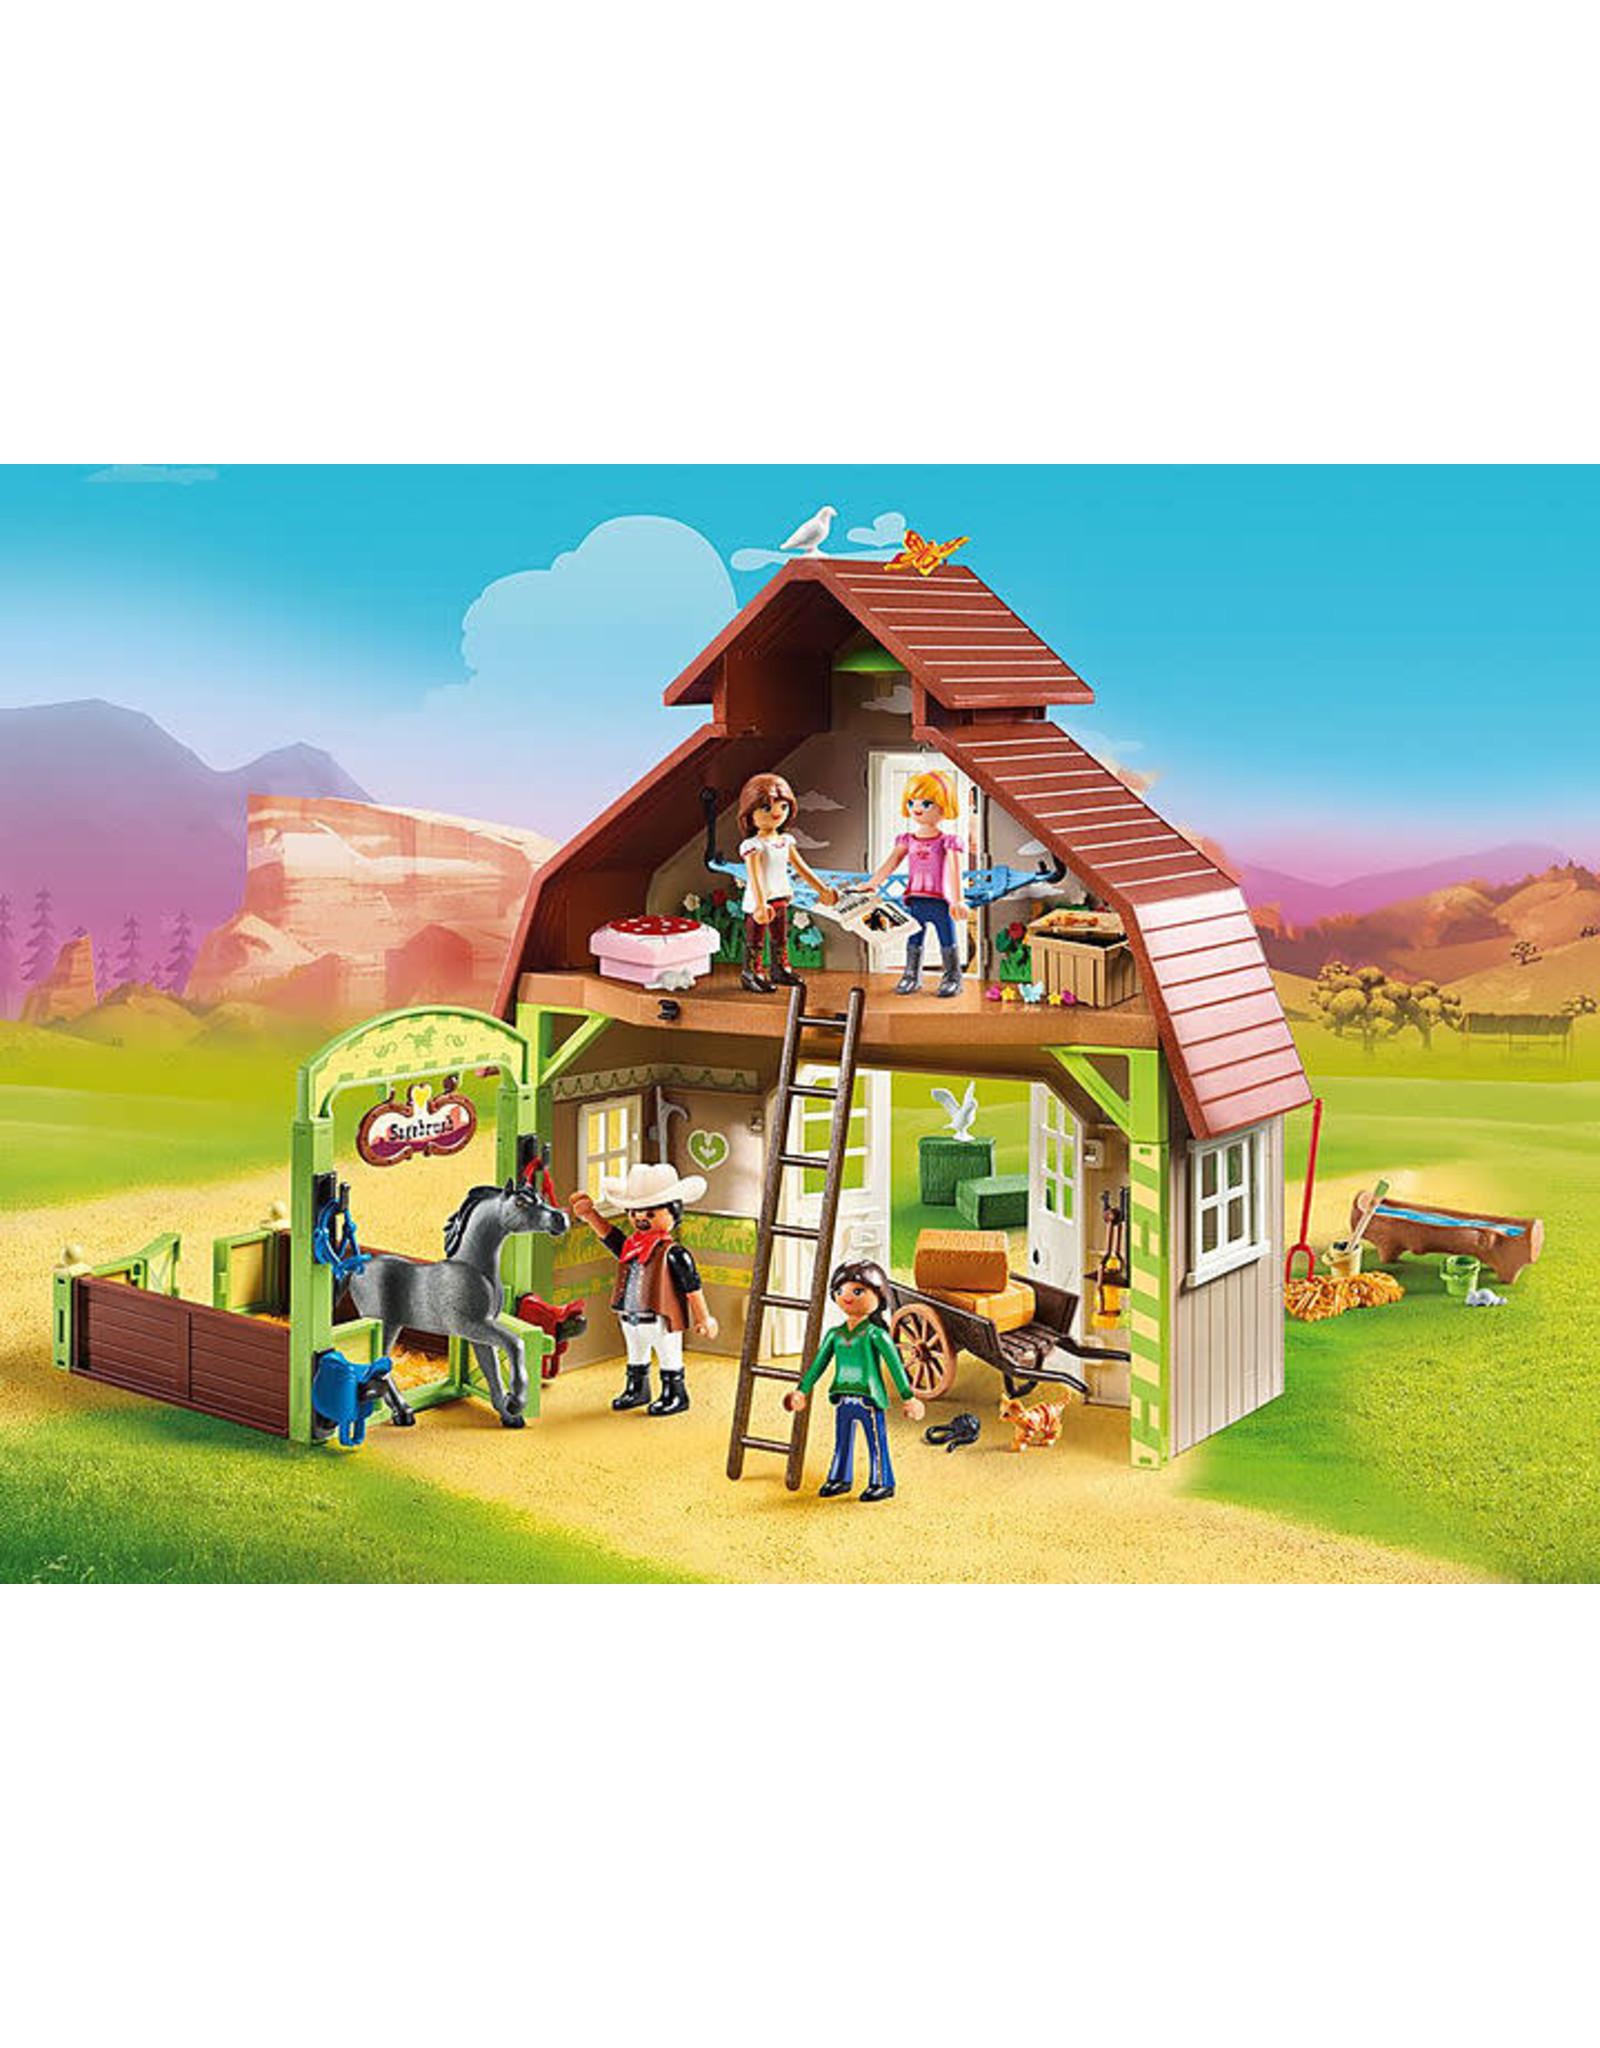 PLAYMOBIL U.S.A. Barn with Lucky, Pru & Abigail